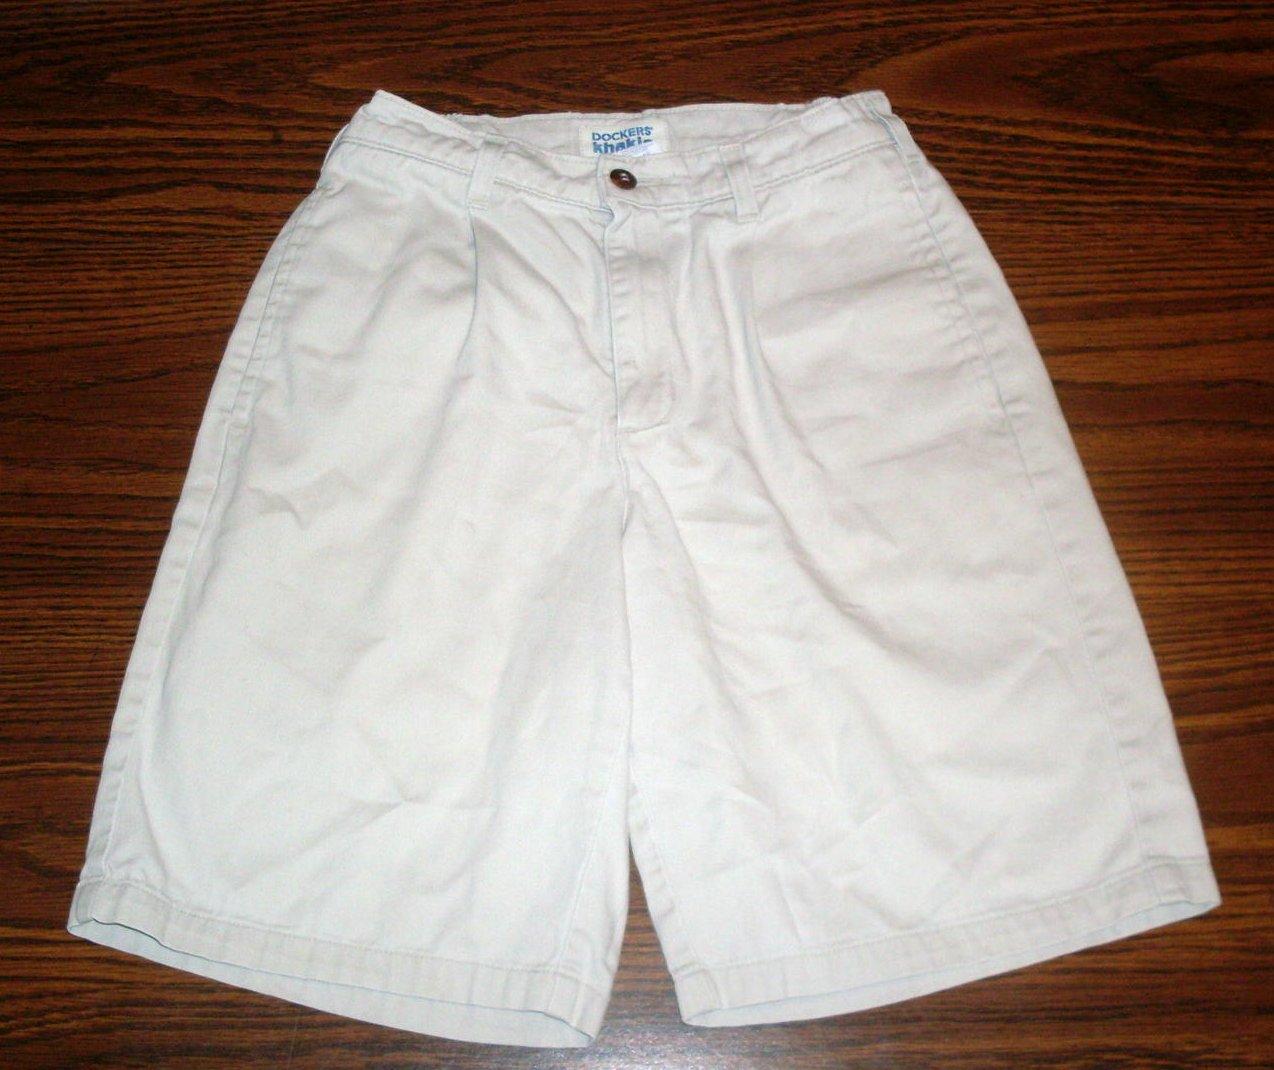 Girls Long Shorts Dockers Light Tan Khaki Size 14 Adjustable Waist